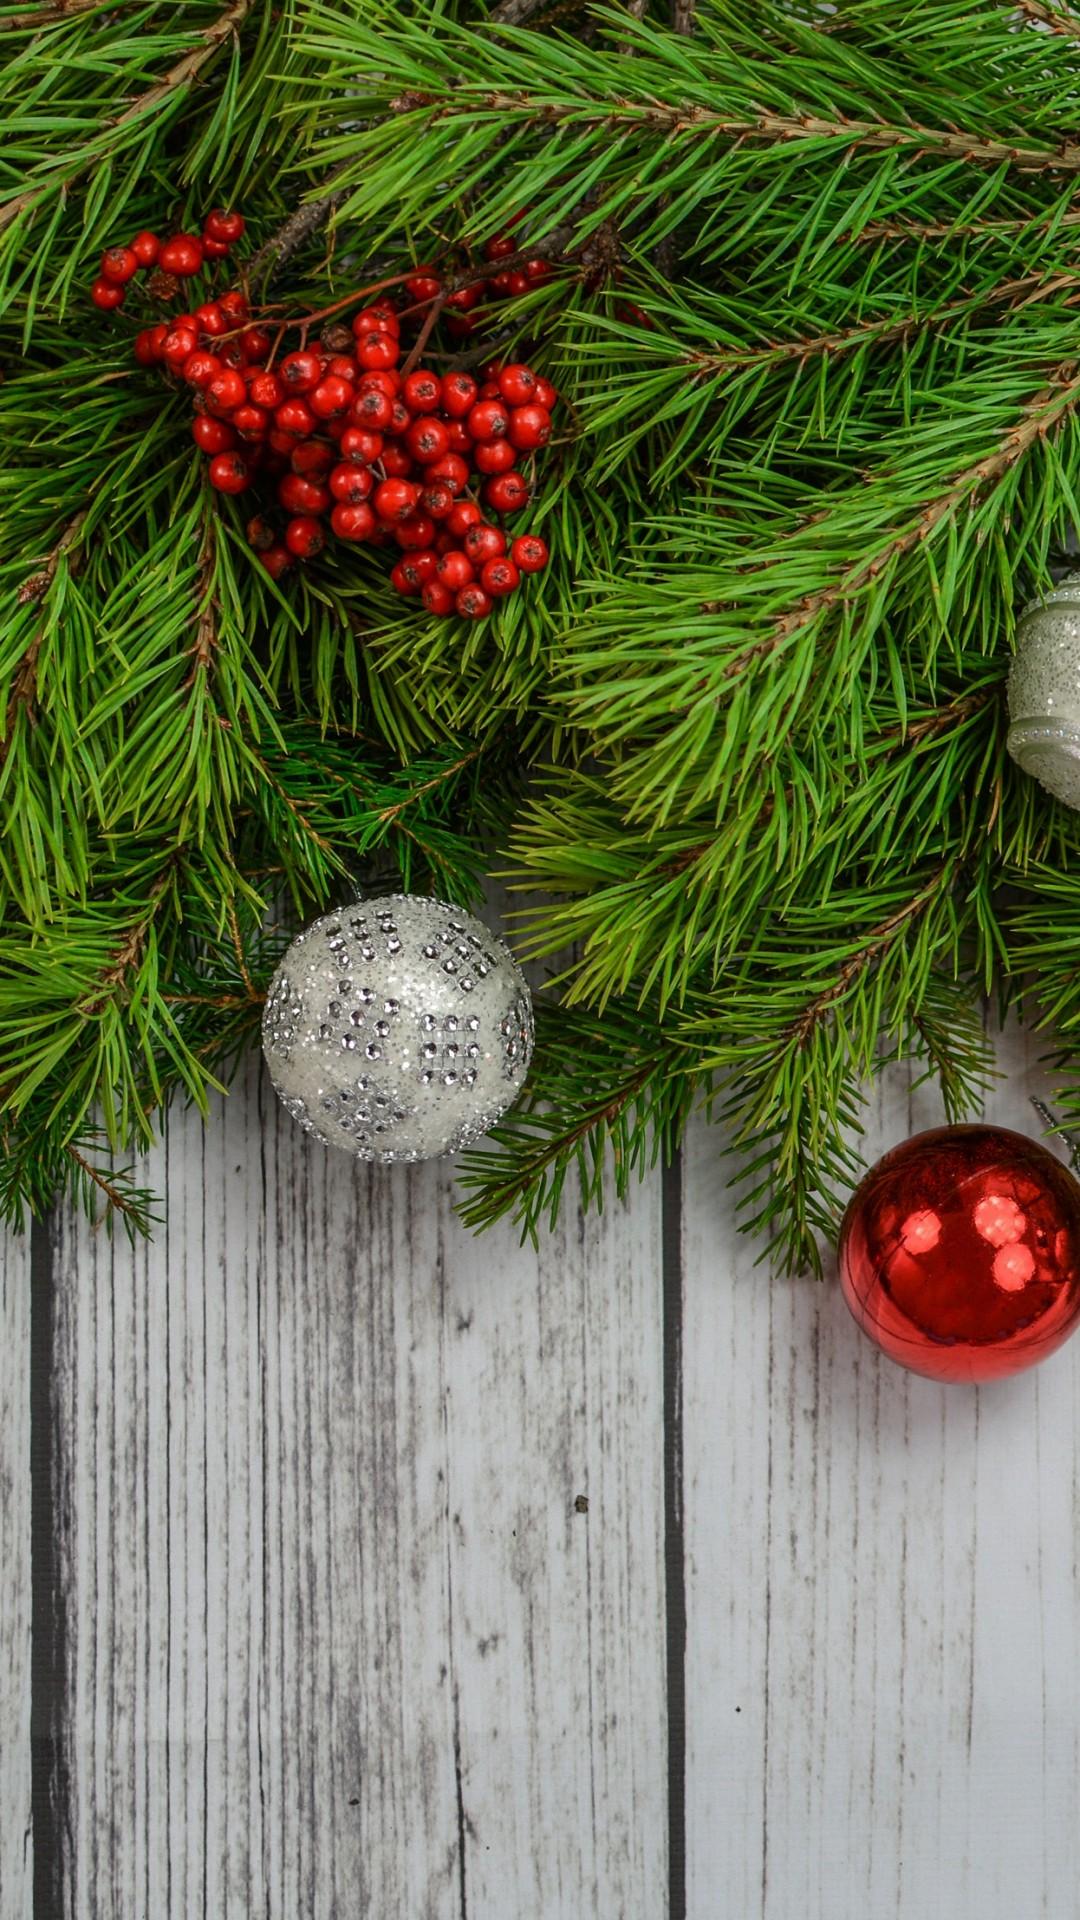 Wallpaper Christmas New Year Toys Fir Tree 4k